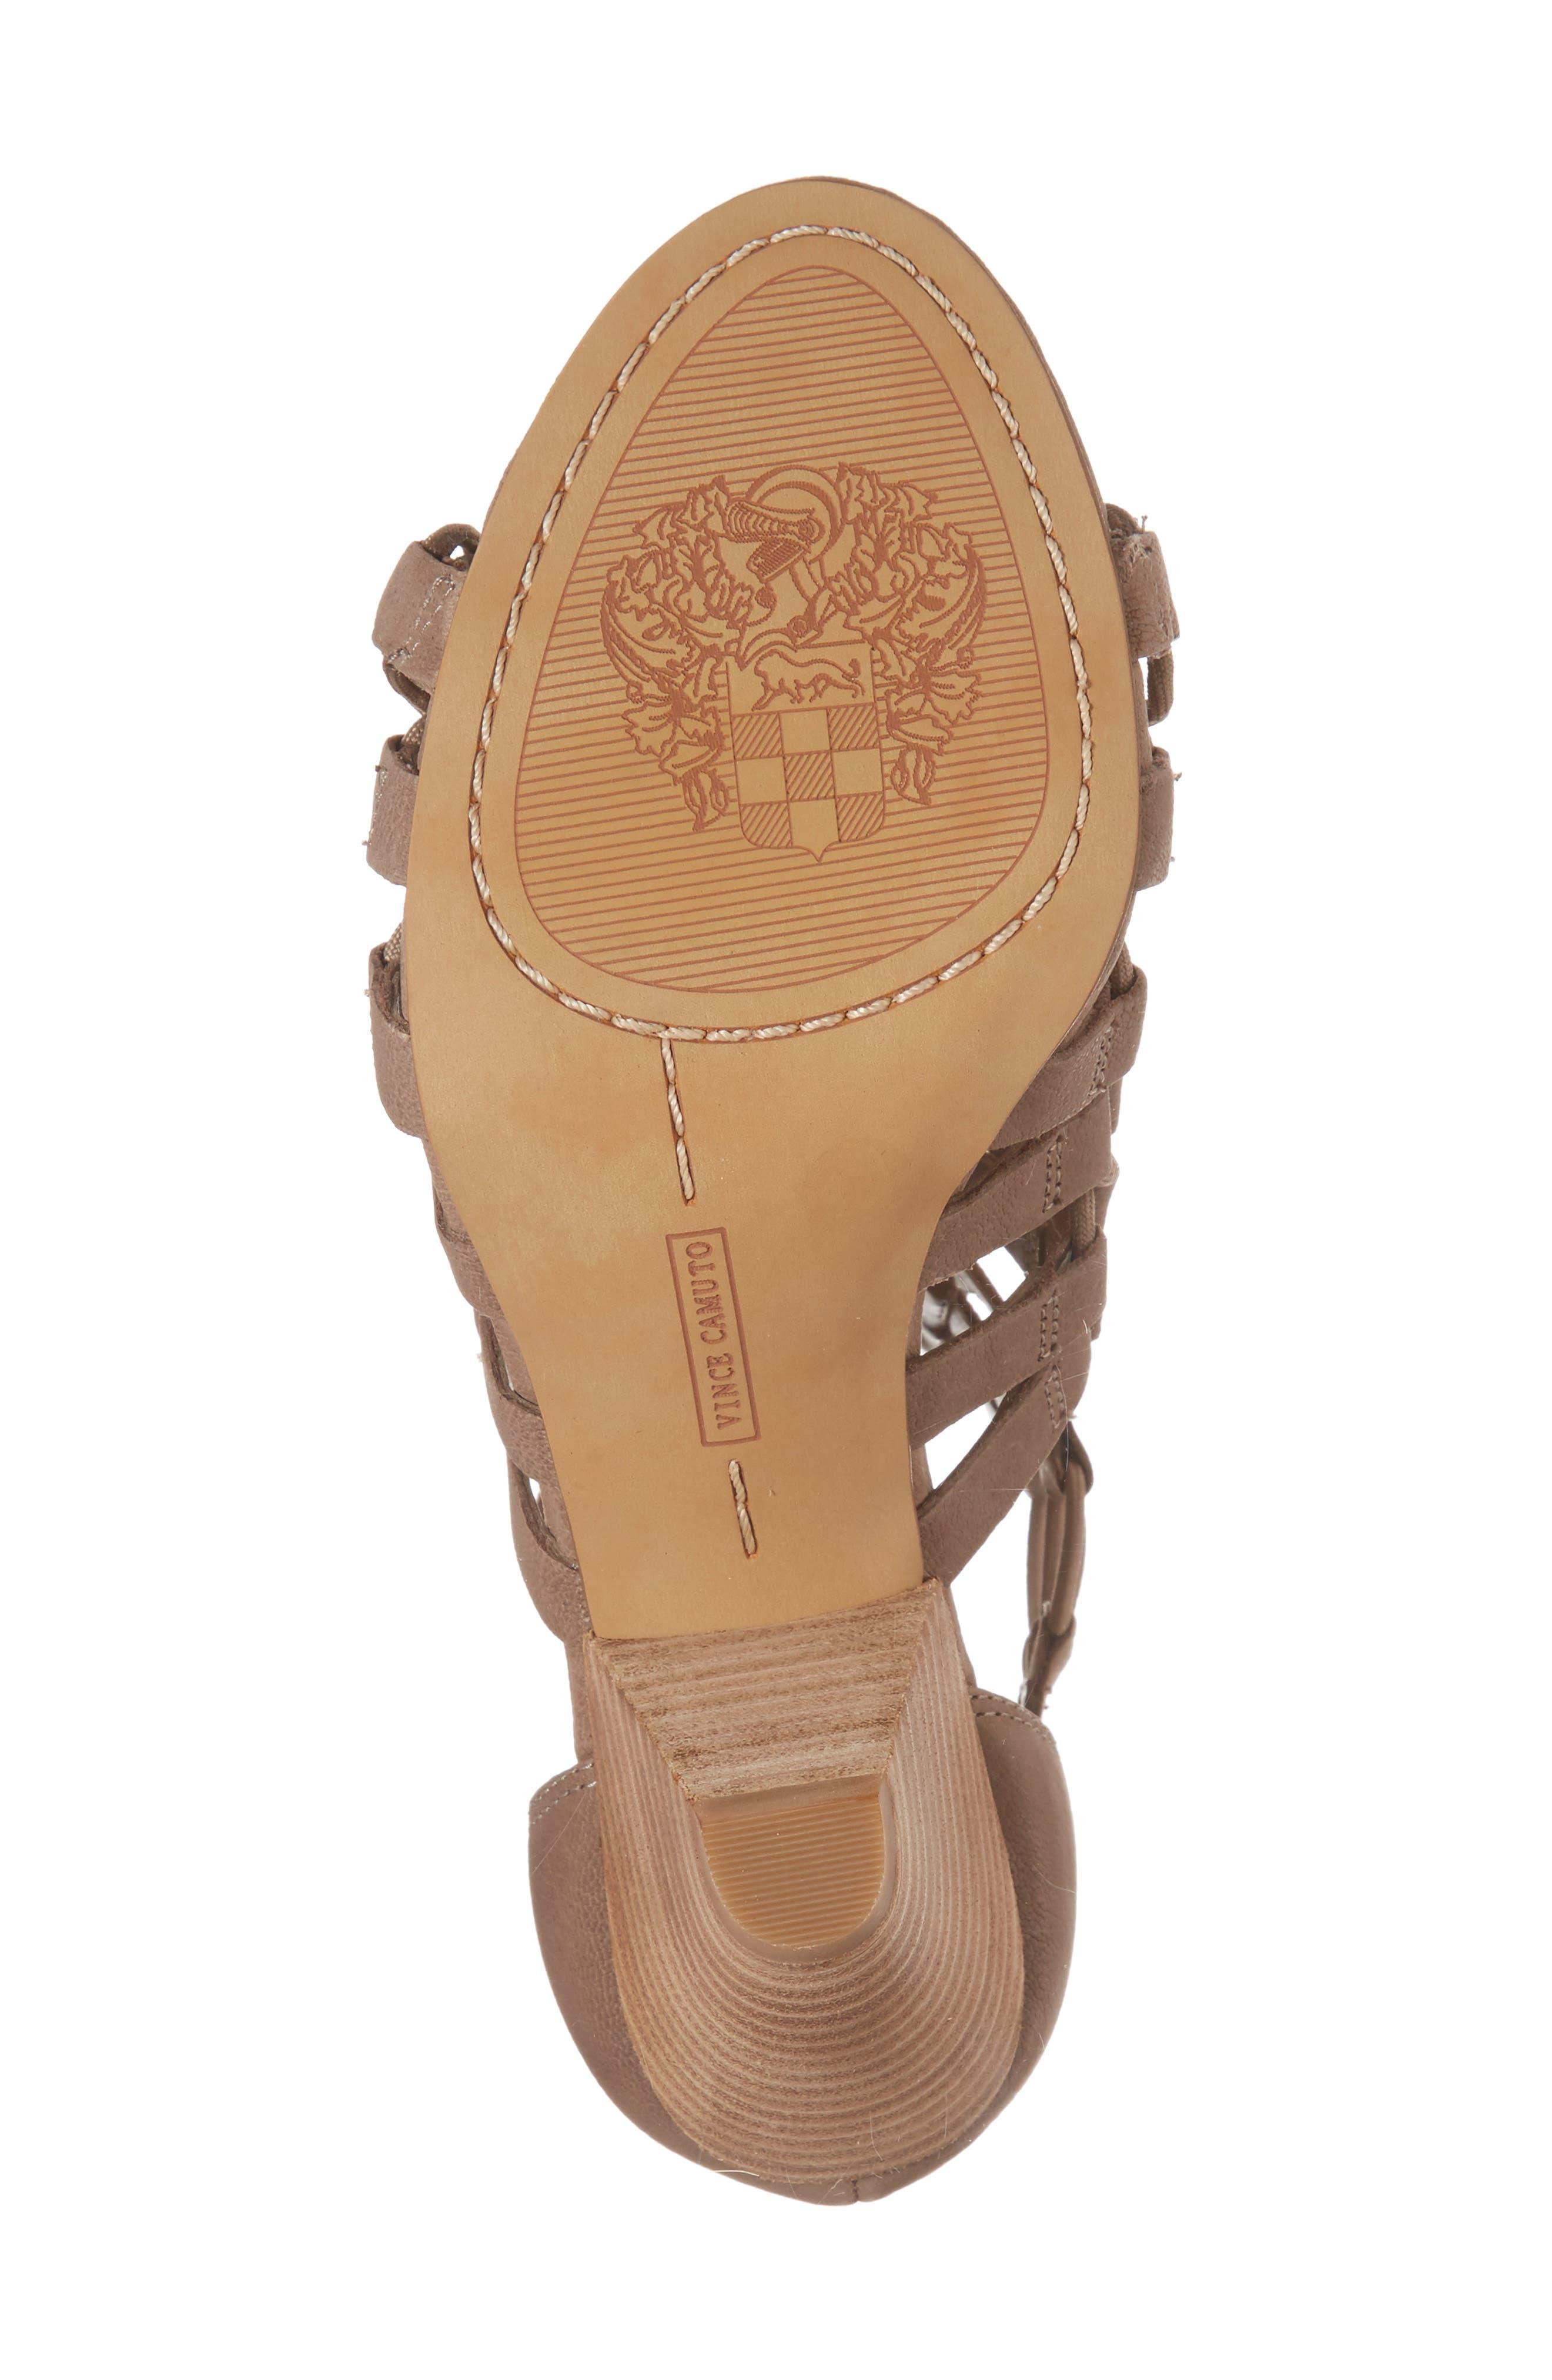 Elanso Sandal,                             Alternate thumbnail 6, color,                             Urban Lux Leather